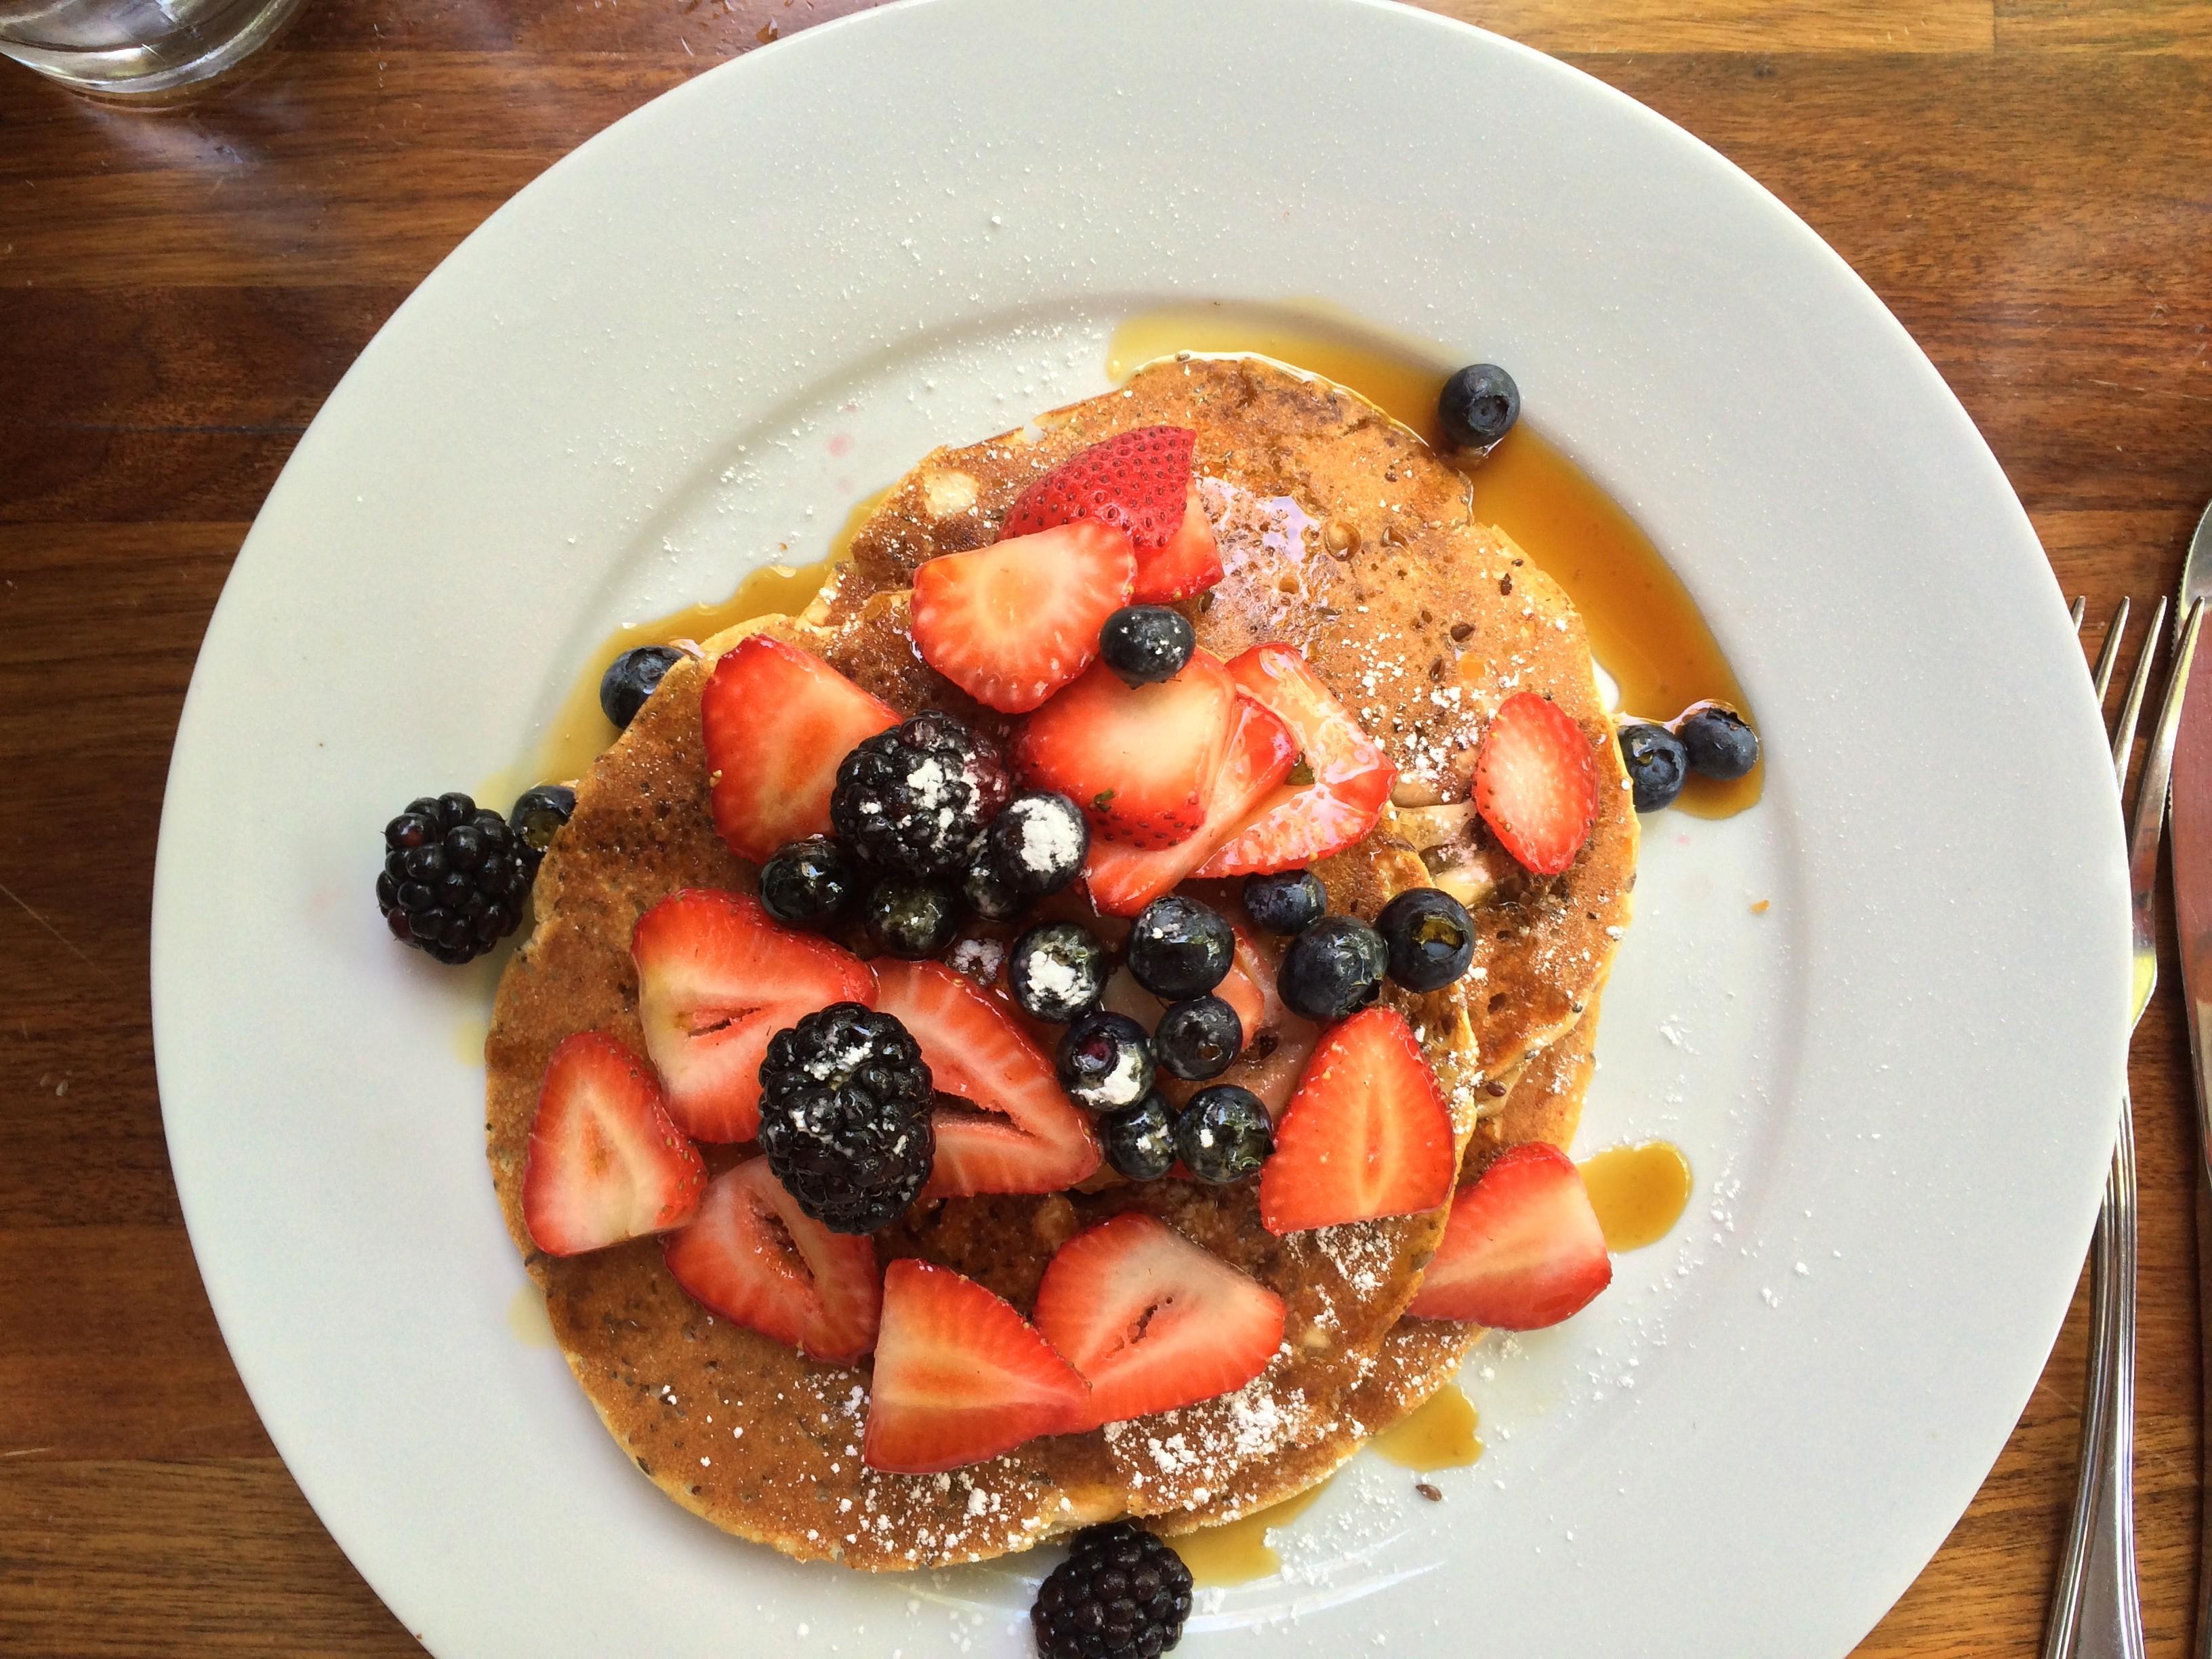 Cafe Vida's organic brown rice pancakes.; Credit: B. Douglas